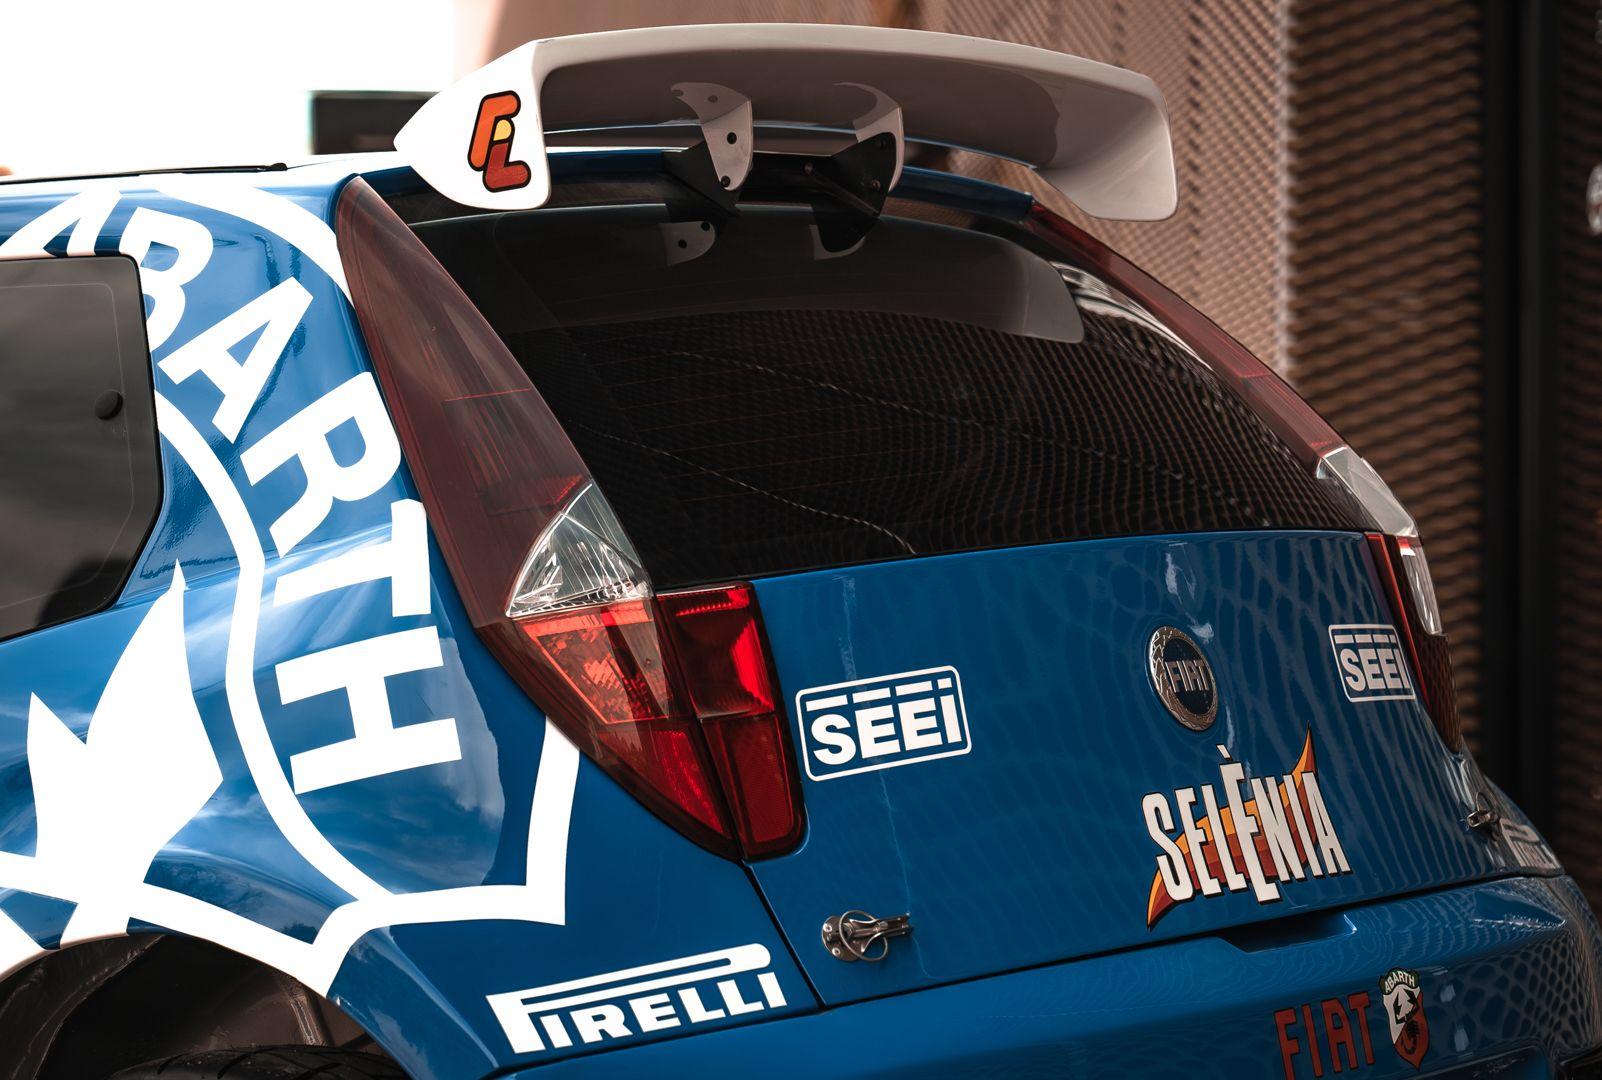 2004 Fiat Punto S1600 Rally 76548